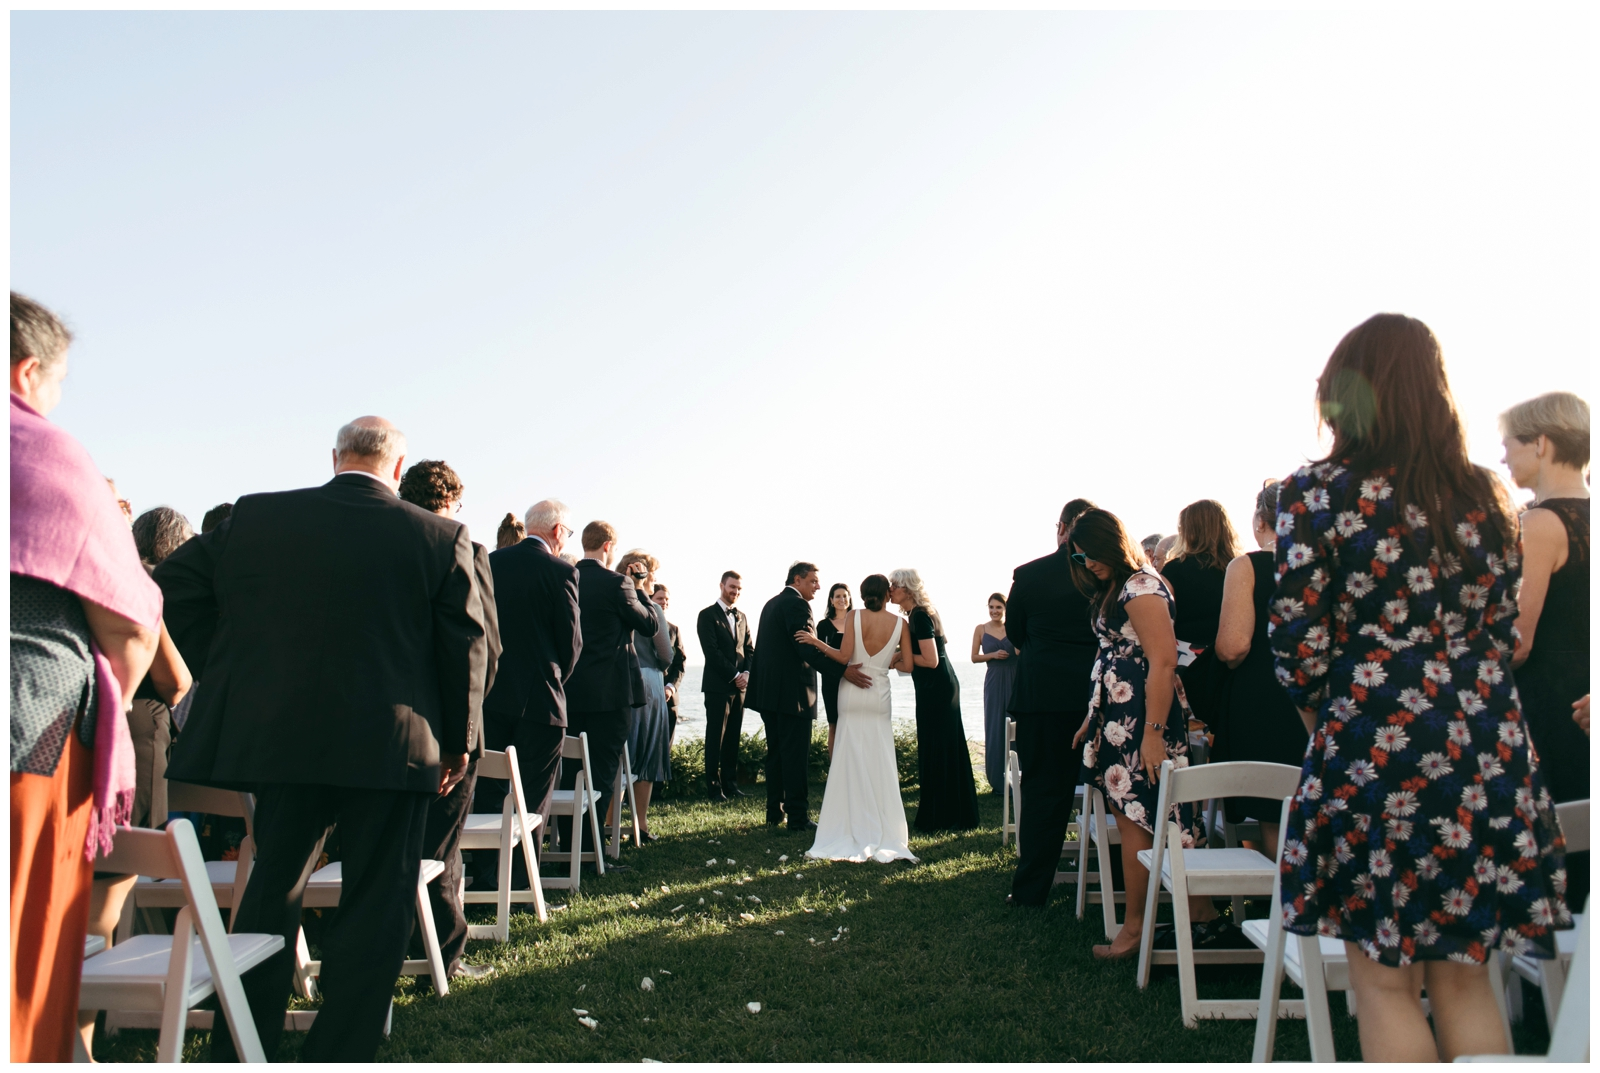 Madison-Beach-Hotel-Wedding-Bailey-Q-Photo-Boston-Wedding-Photographer-031.jpg